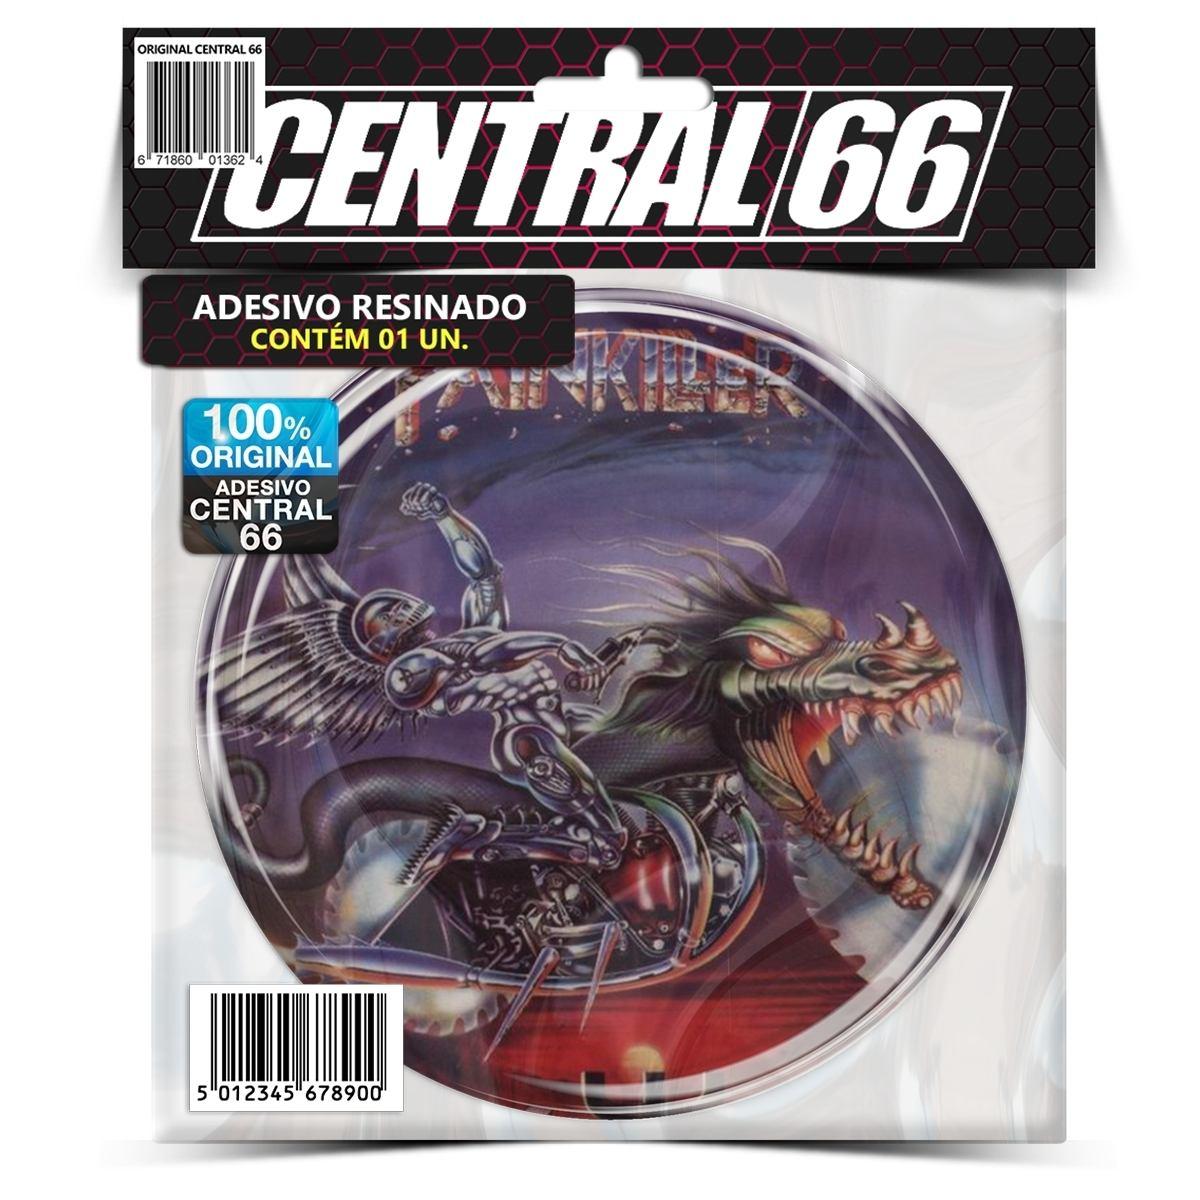 Adesivo Redondo Pink Floyd The Dark Side the Moon M02 – Central 66